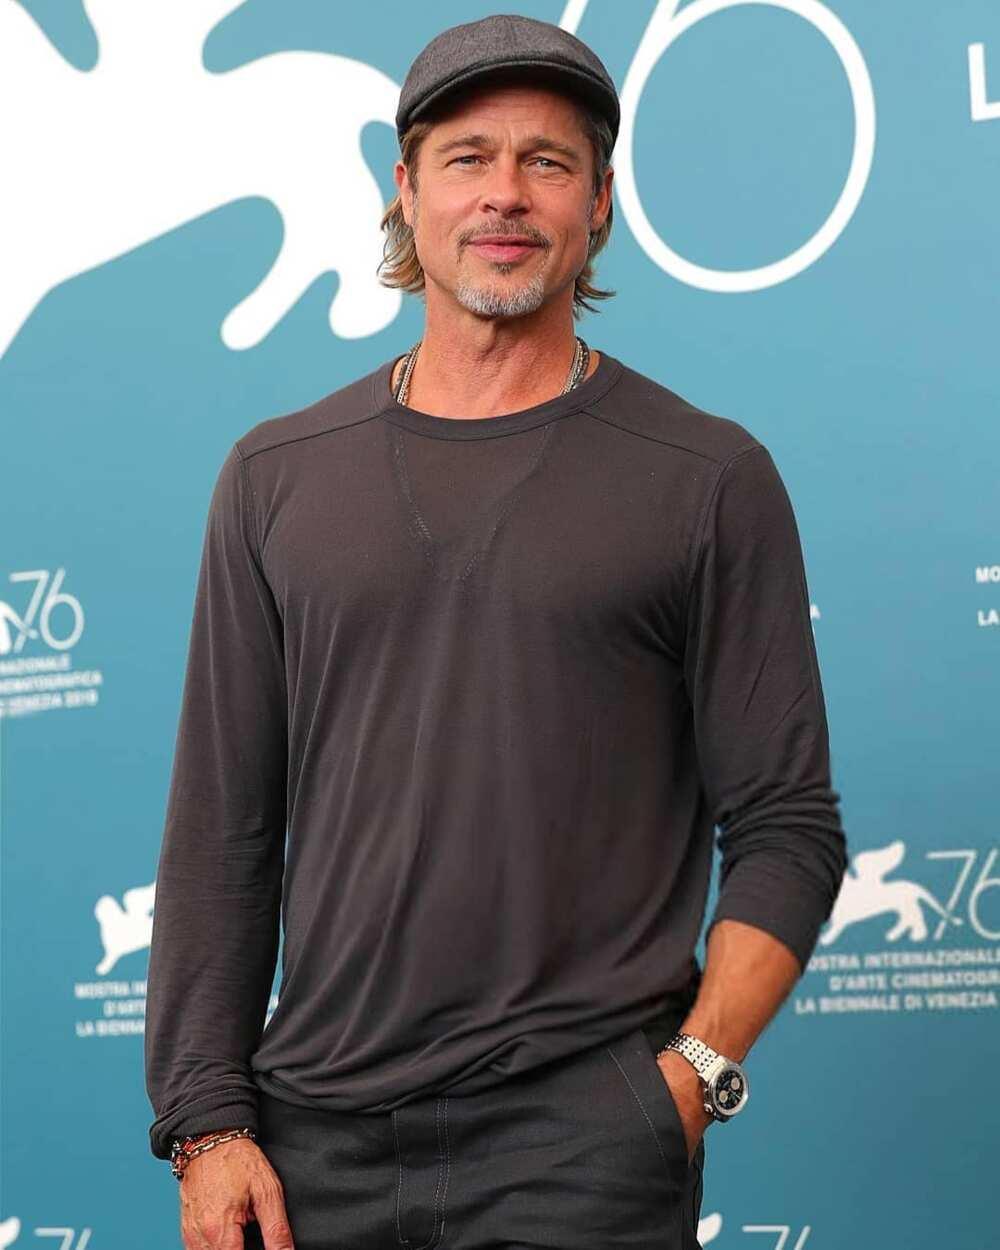 Actor Brad Pitt breaks up with girlfriend Nicole Poturalski